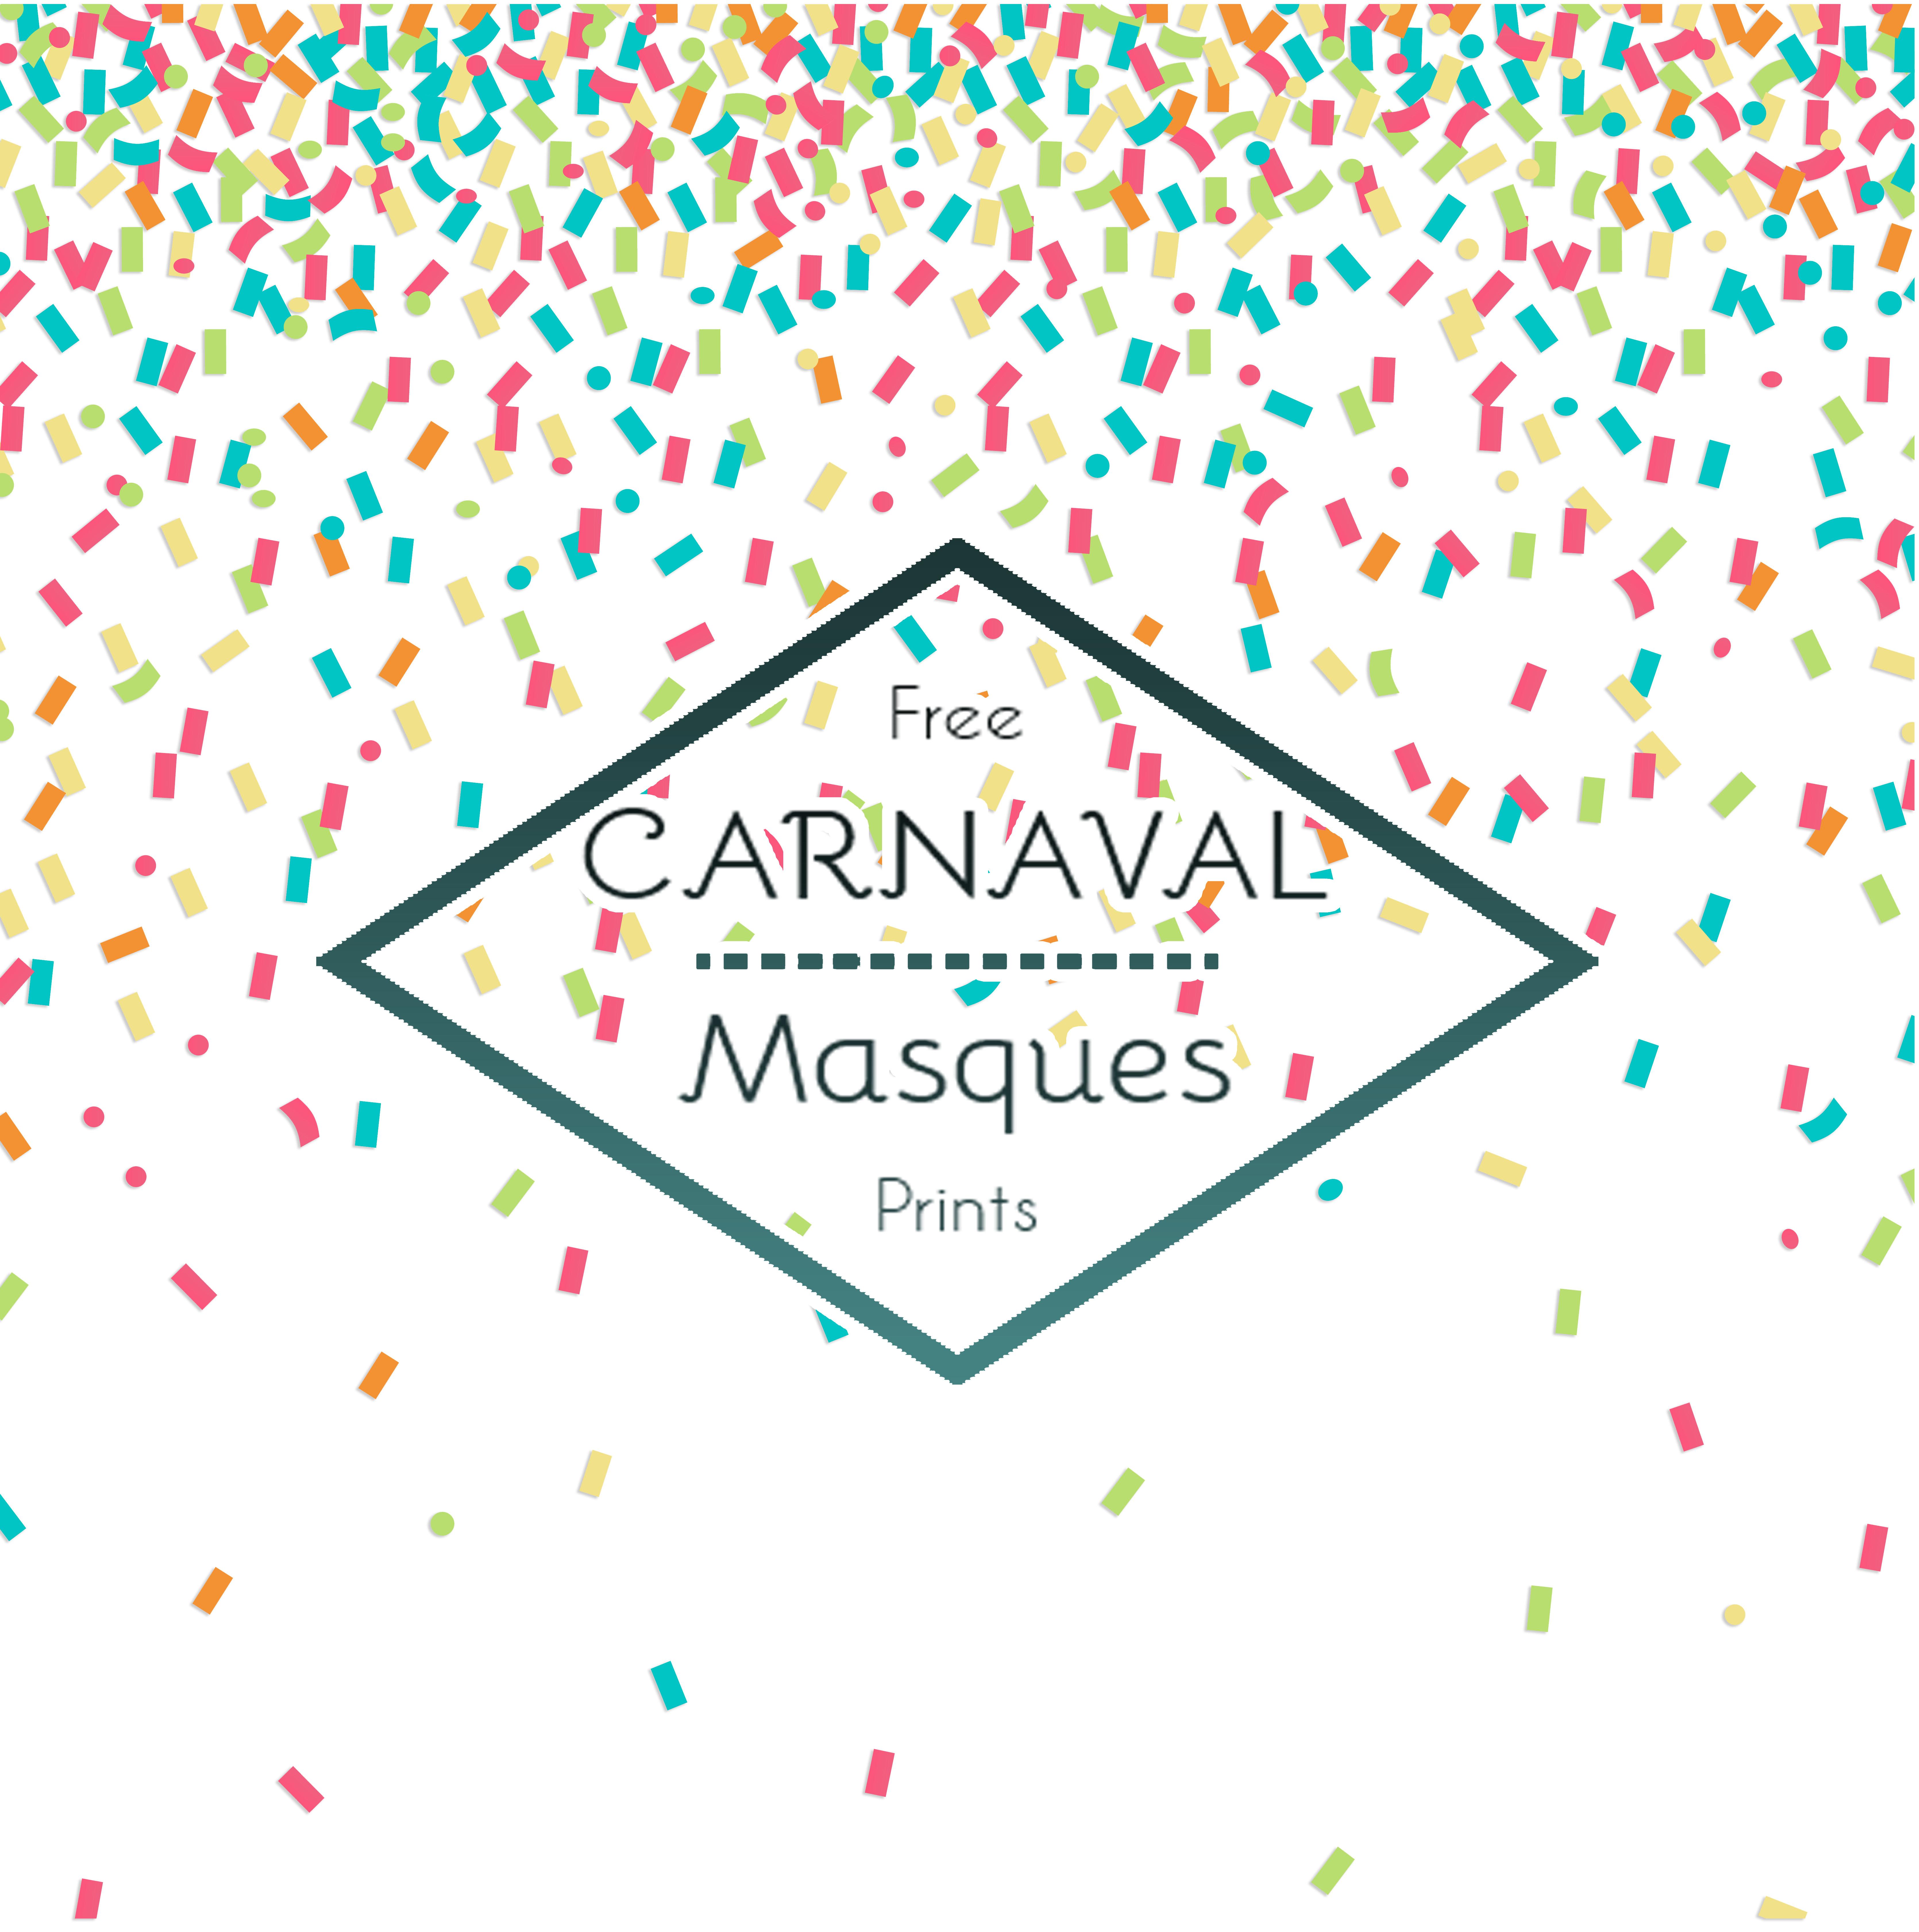 masque de carnaval free printable